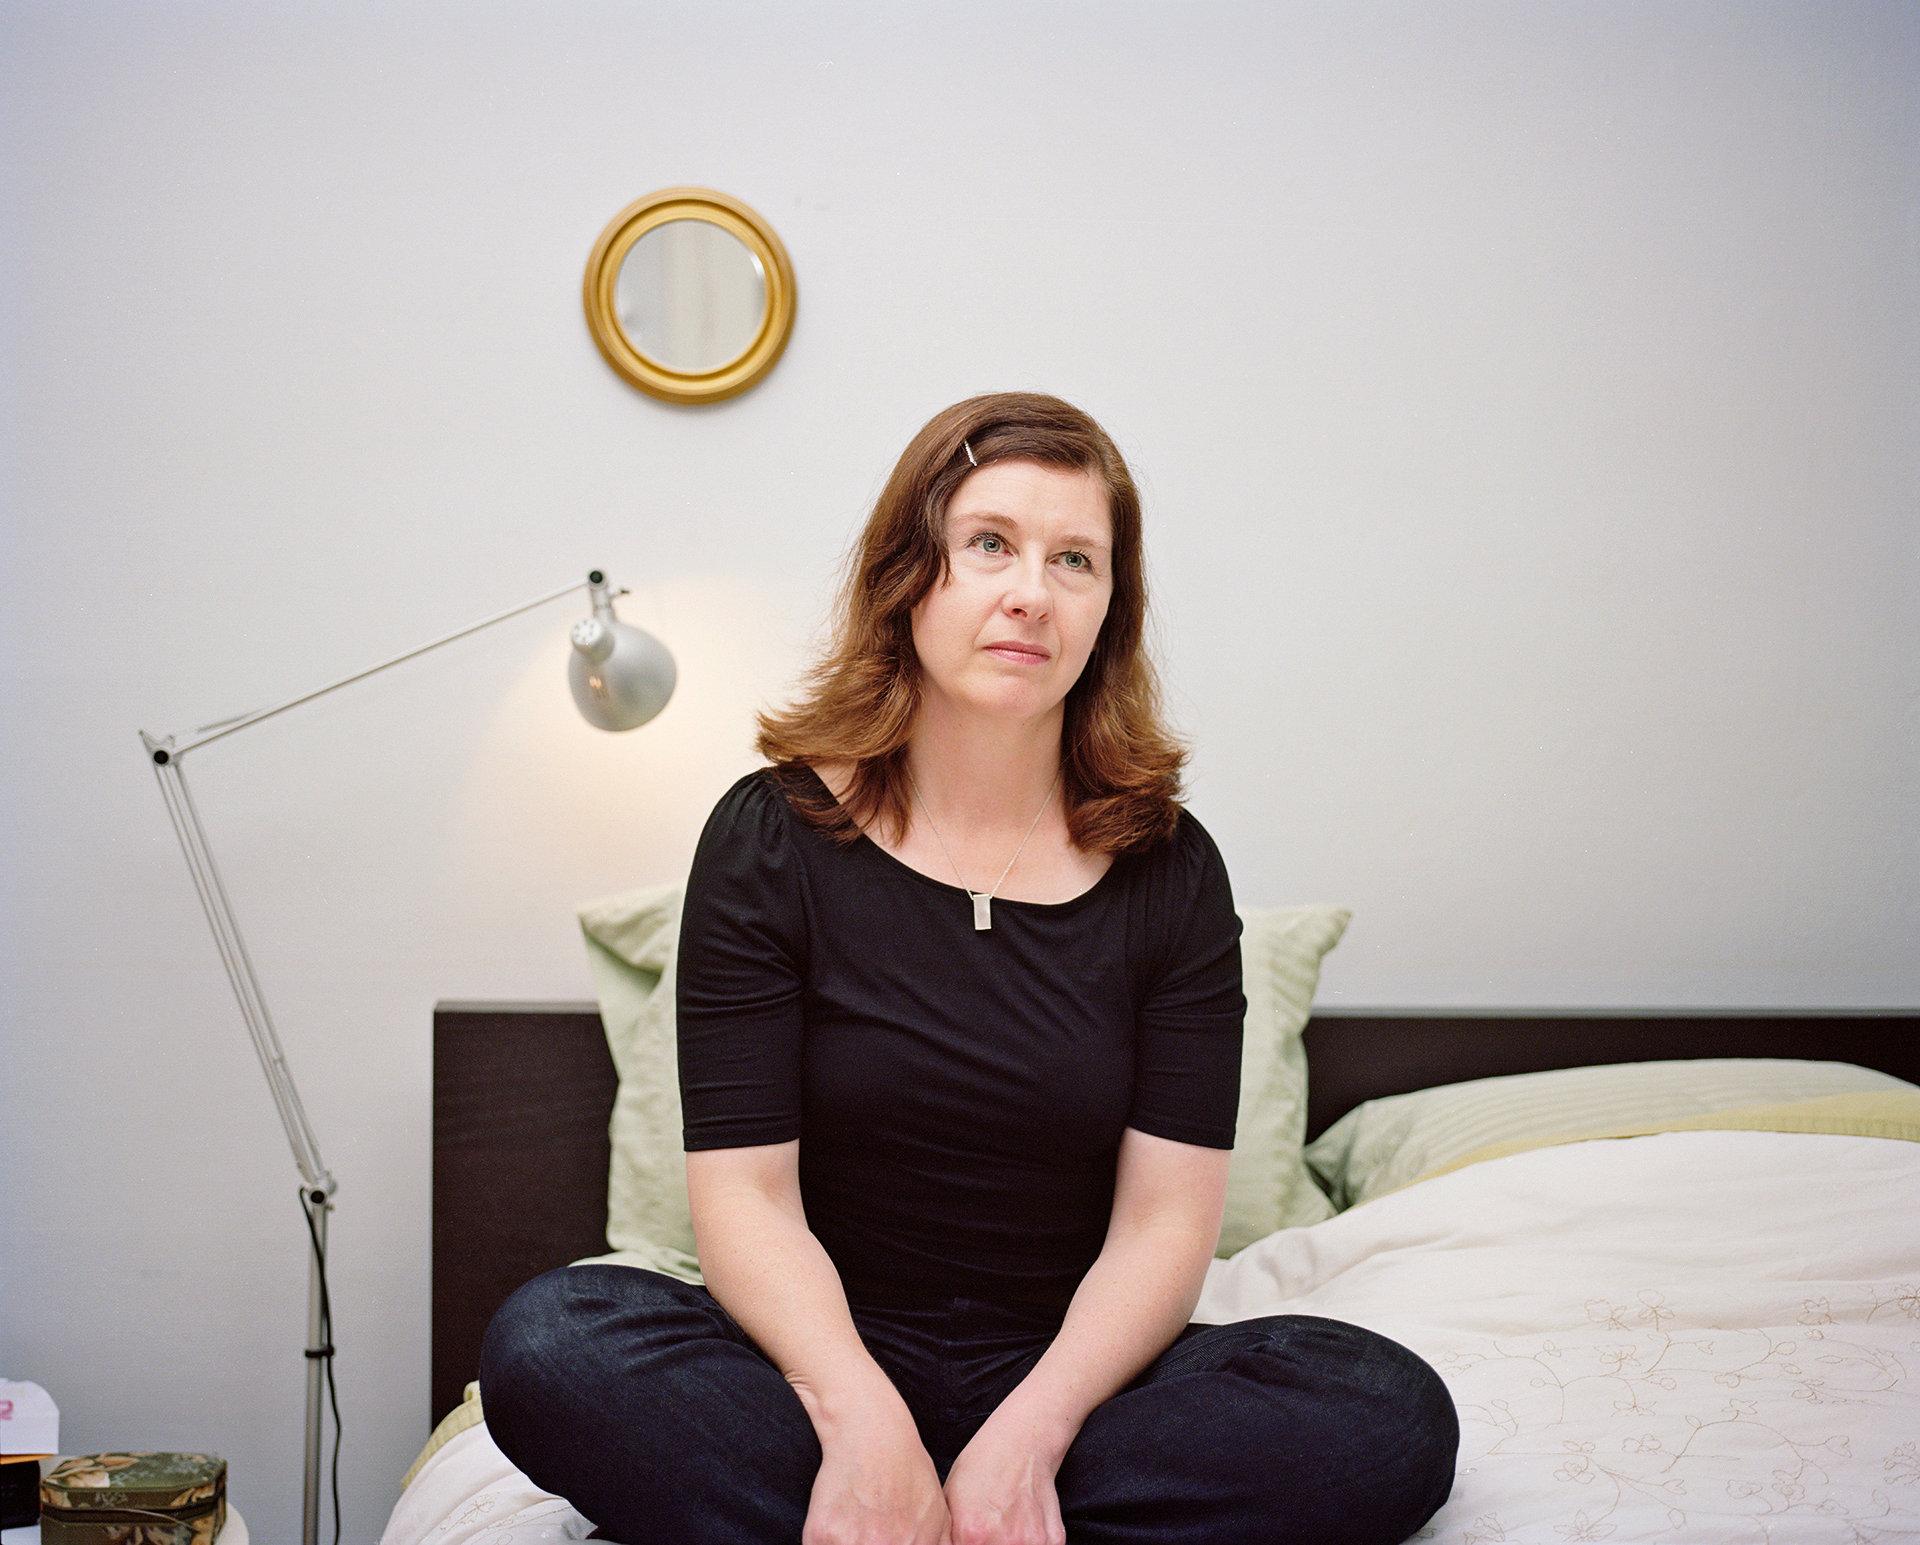 Mia Hamm,Hana Holisova Adult tube Anais Barbeau-Lavalette,Emily Sandberg